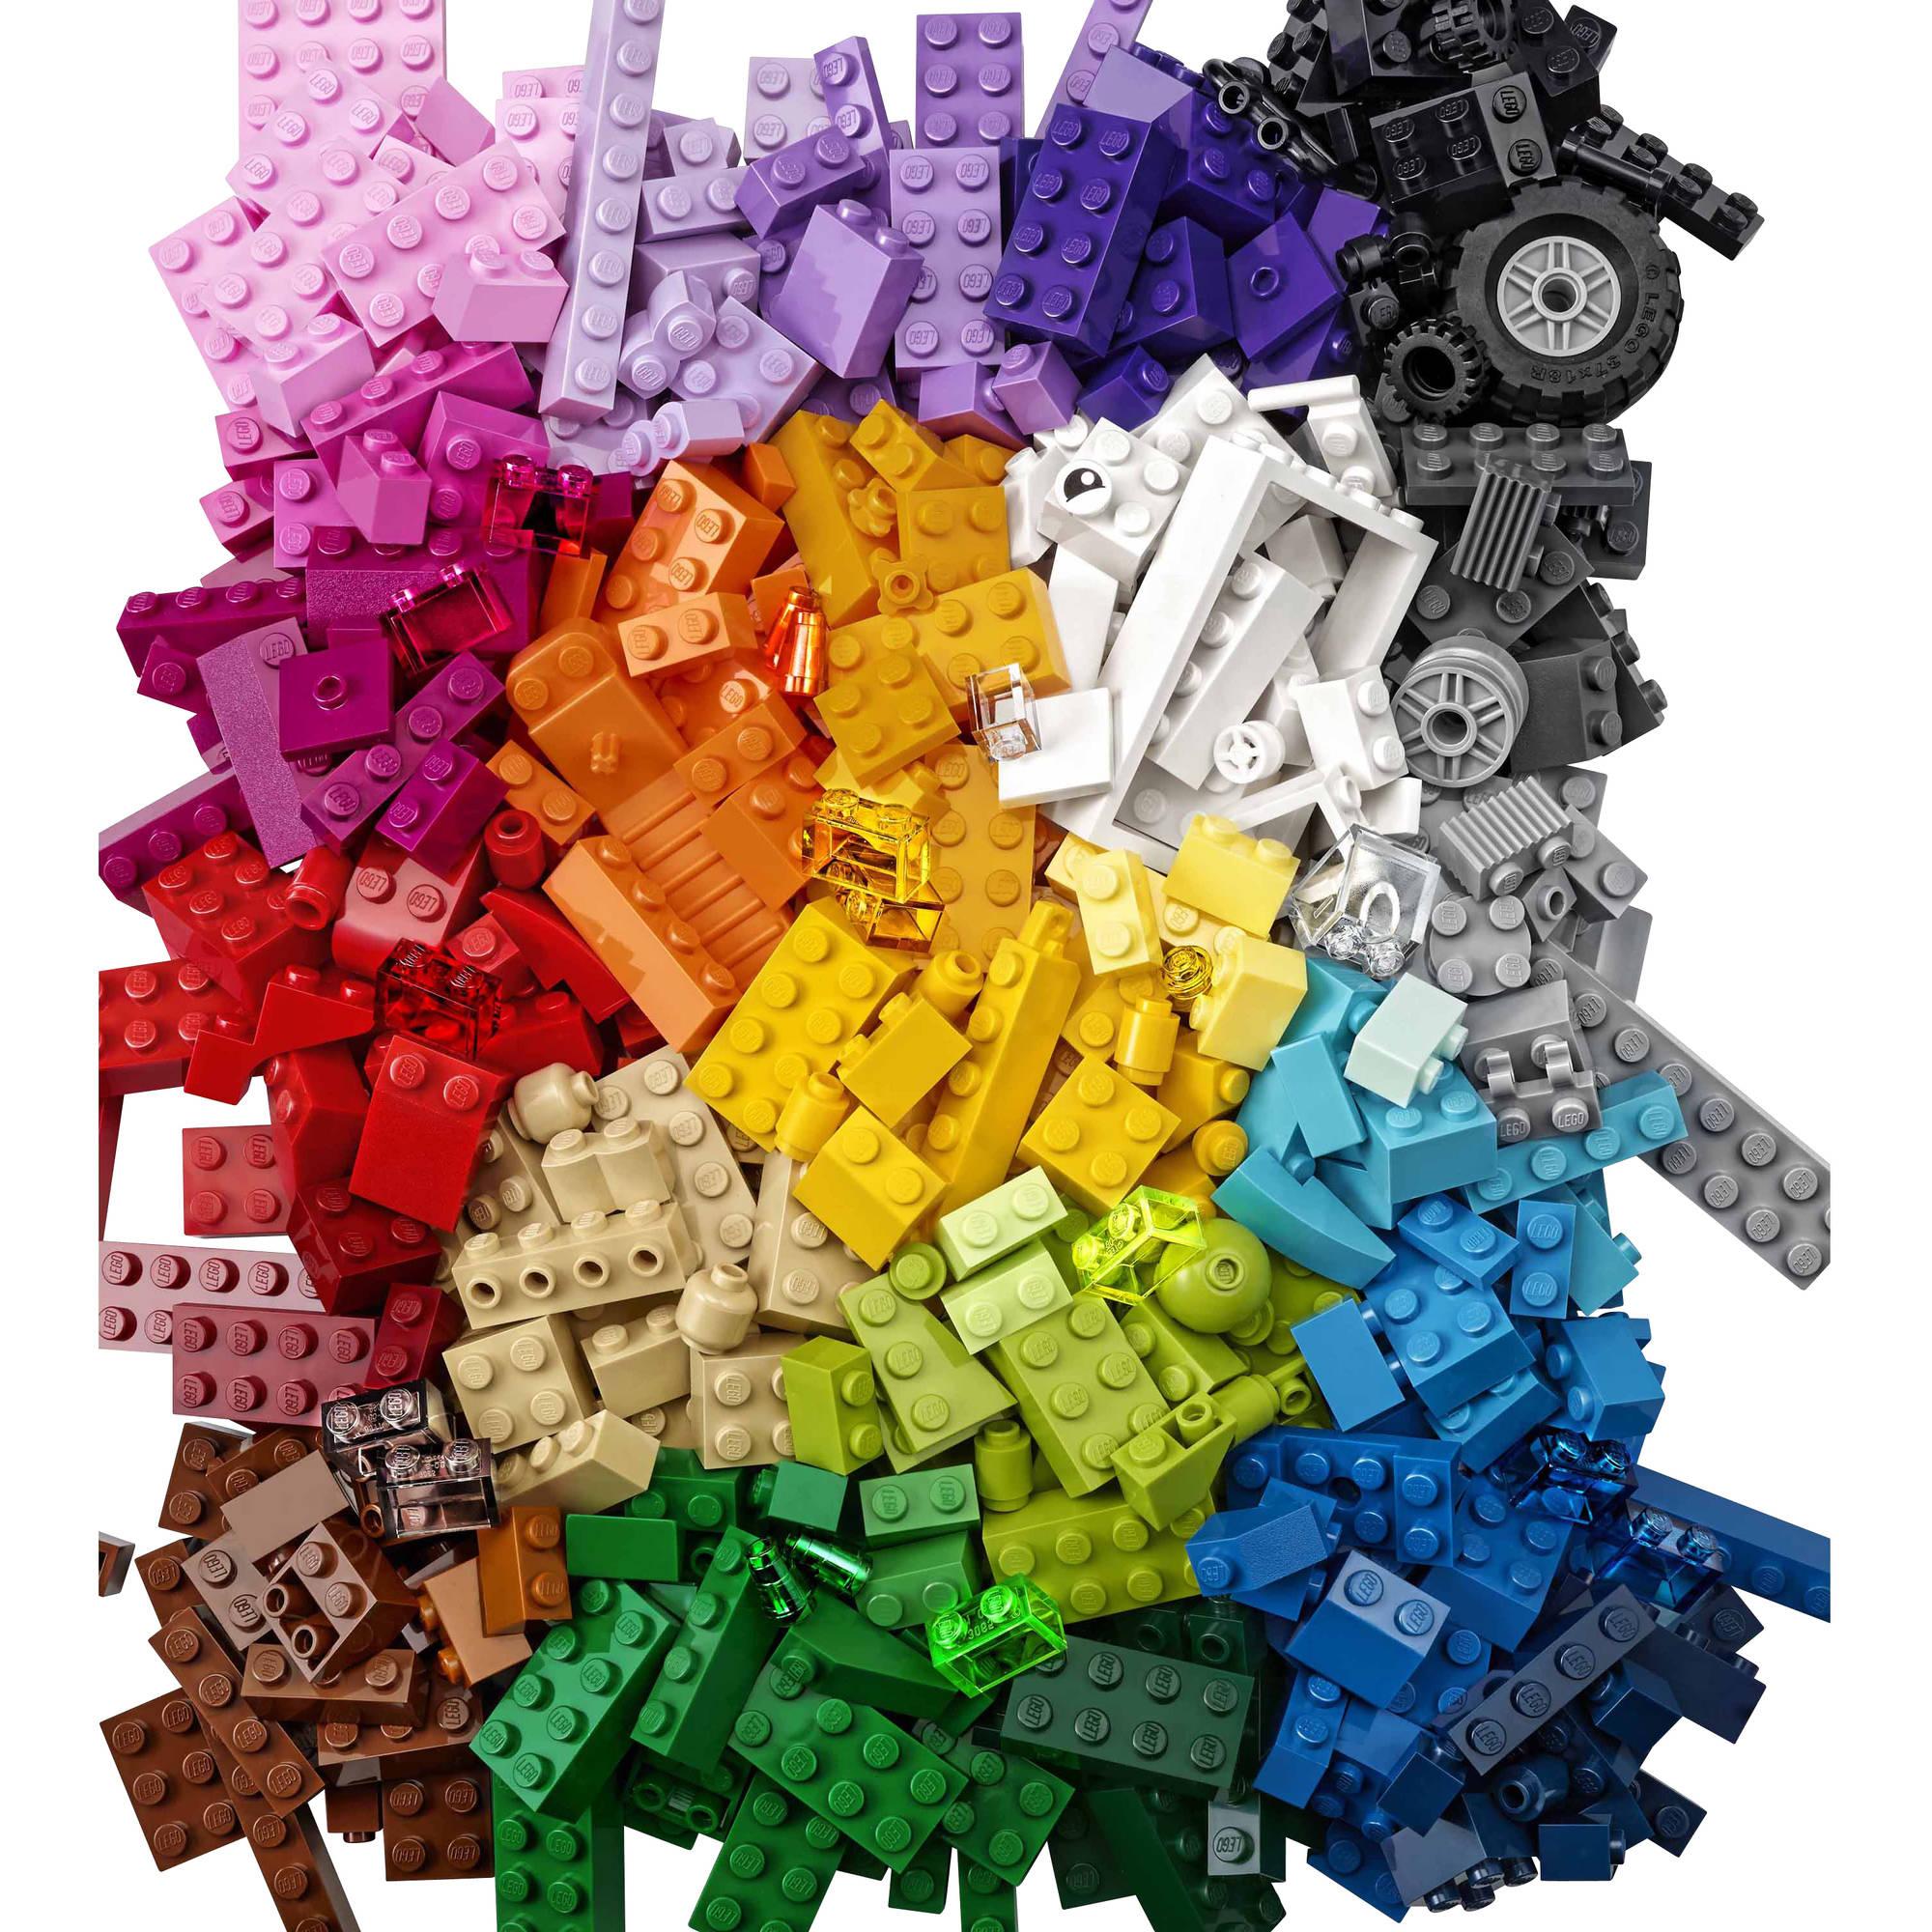 rainbow lego